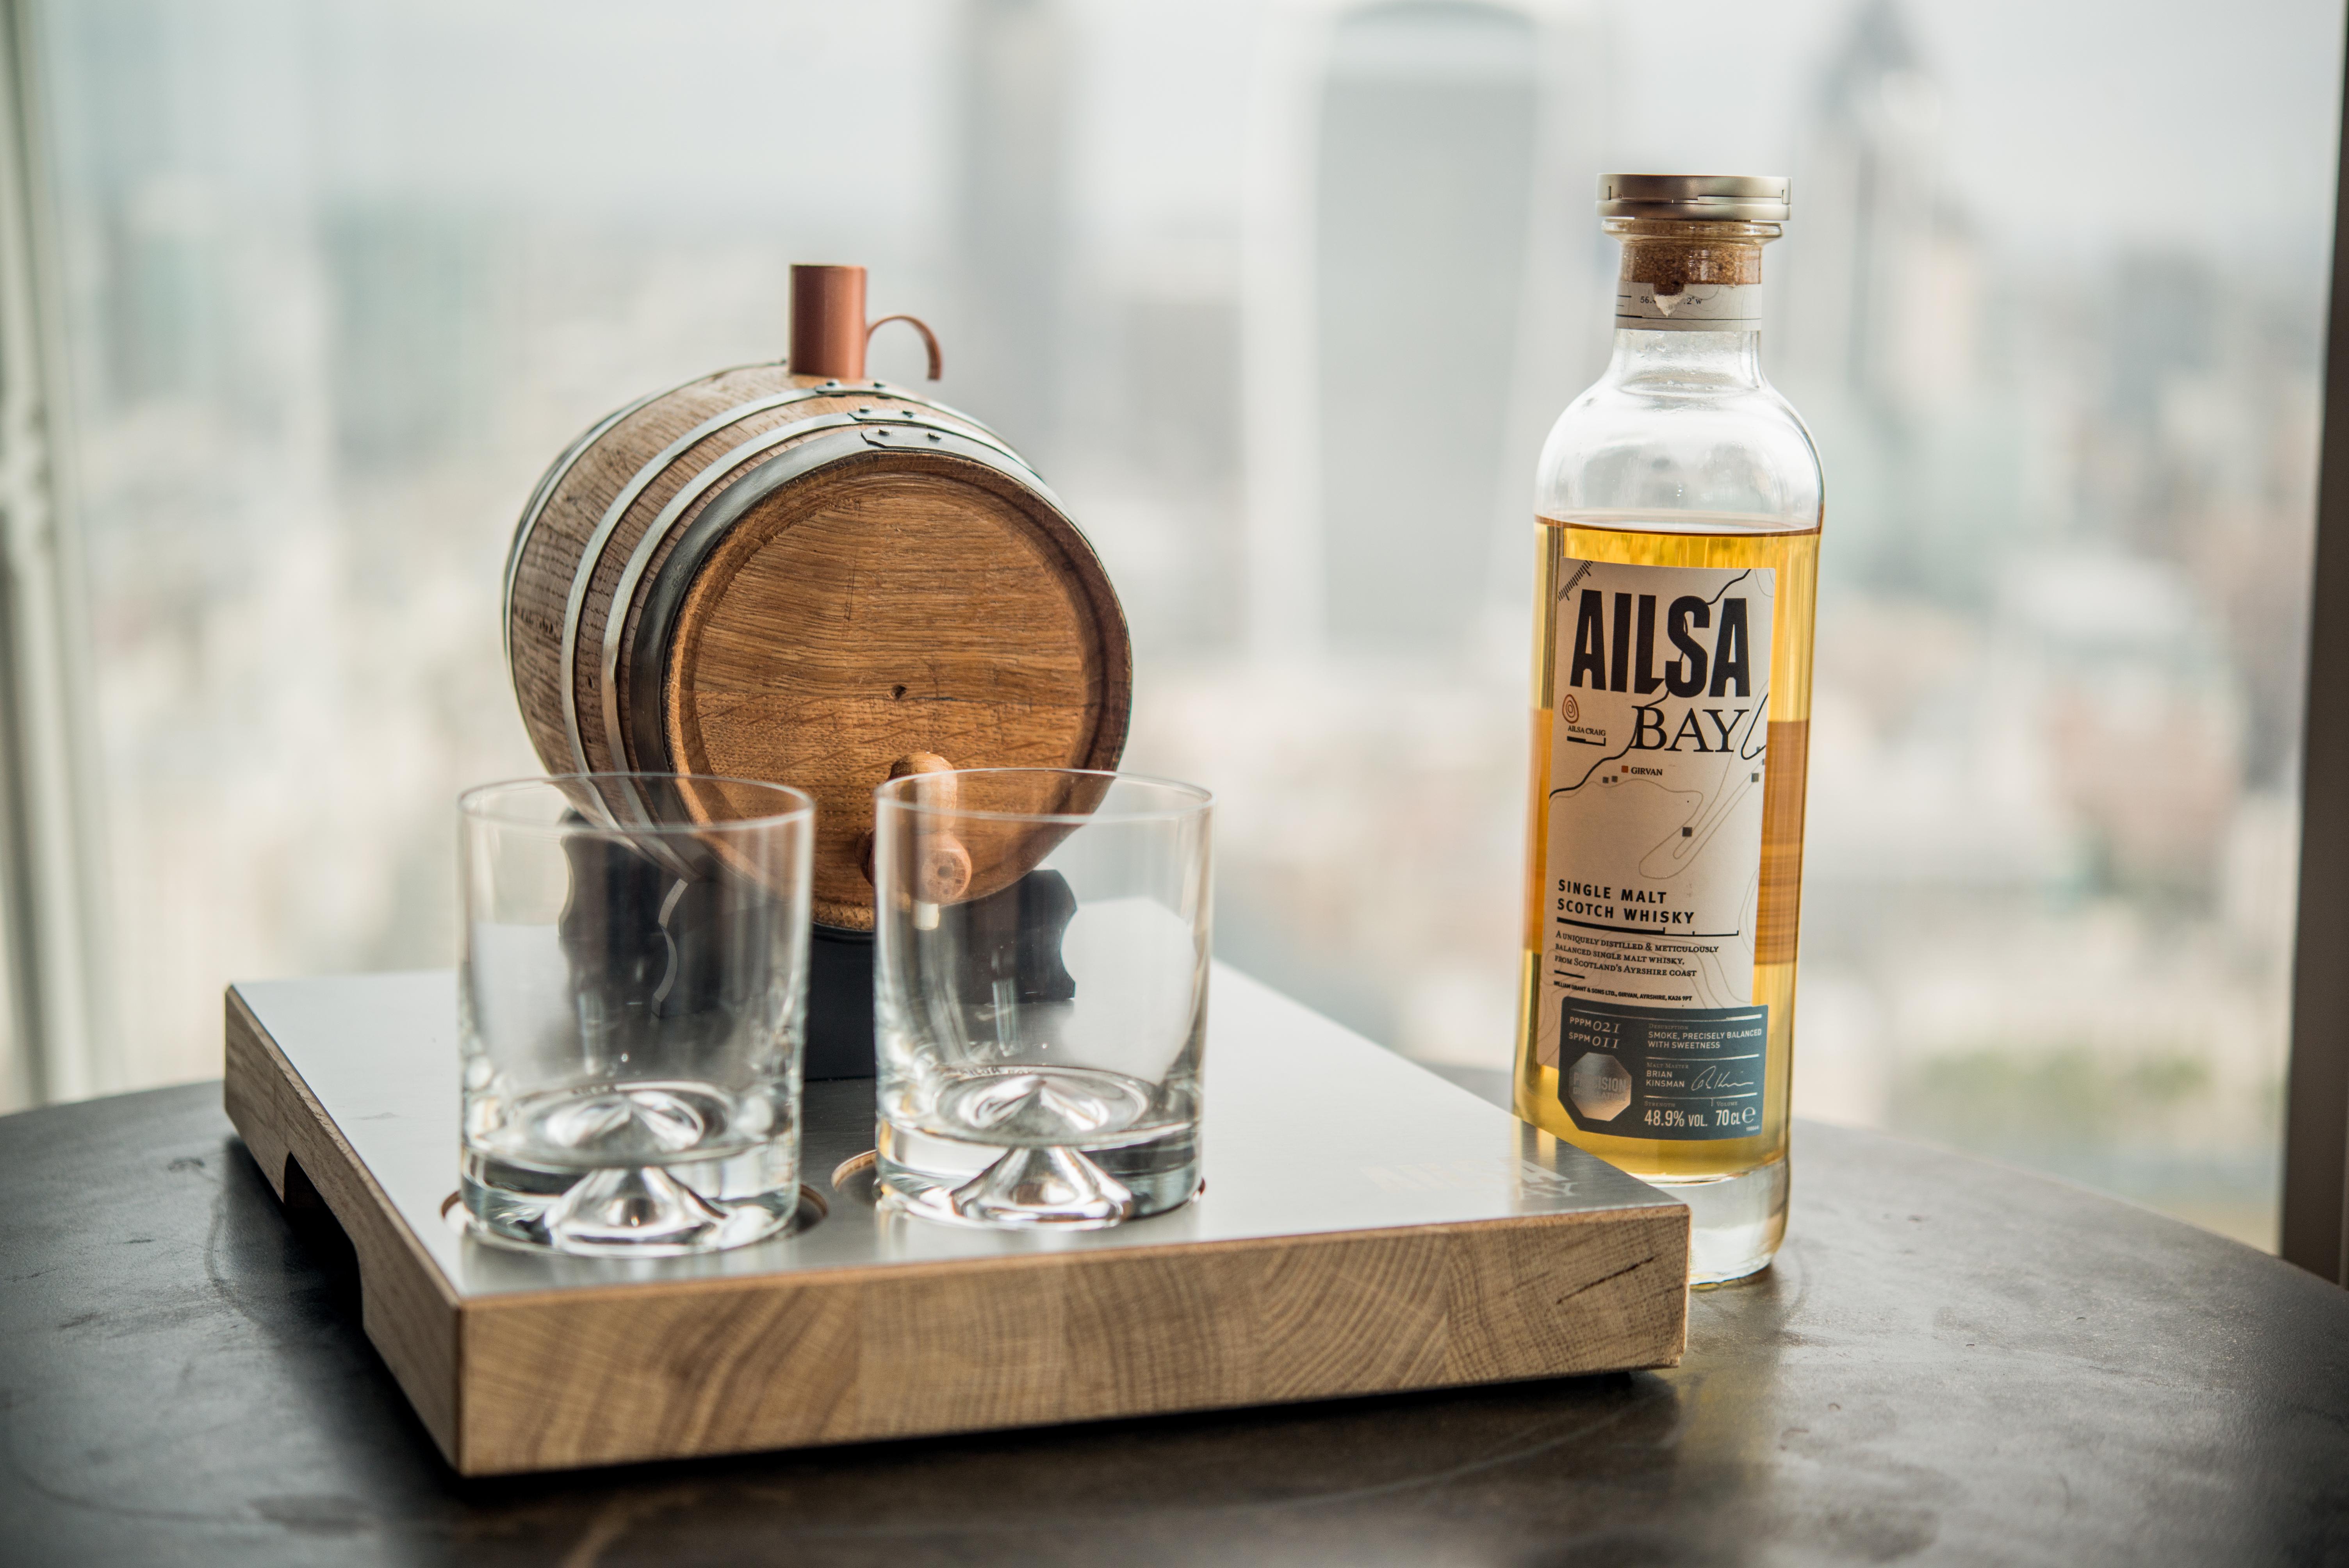 Ailsa Bay - Bespoke Drinks Serve